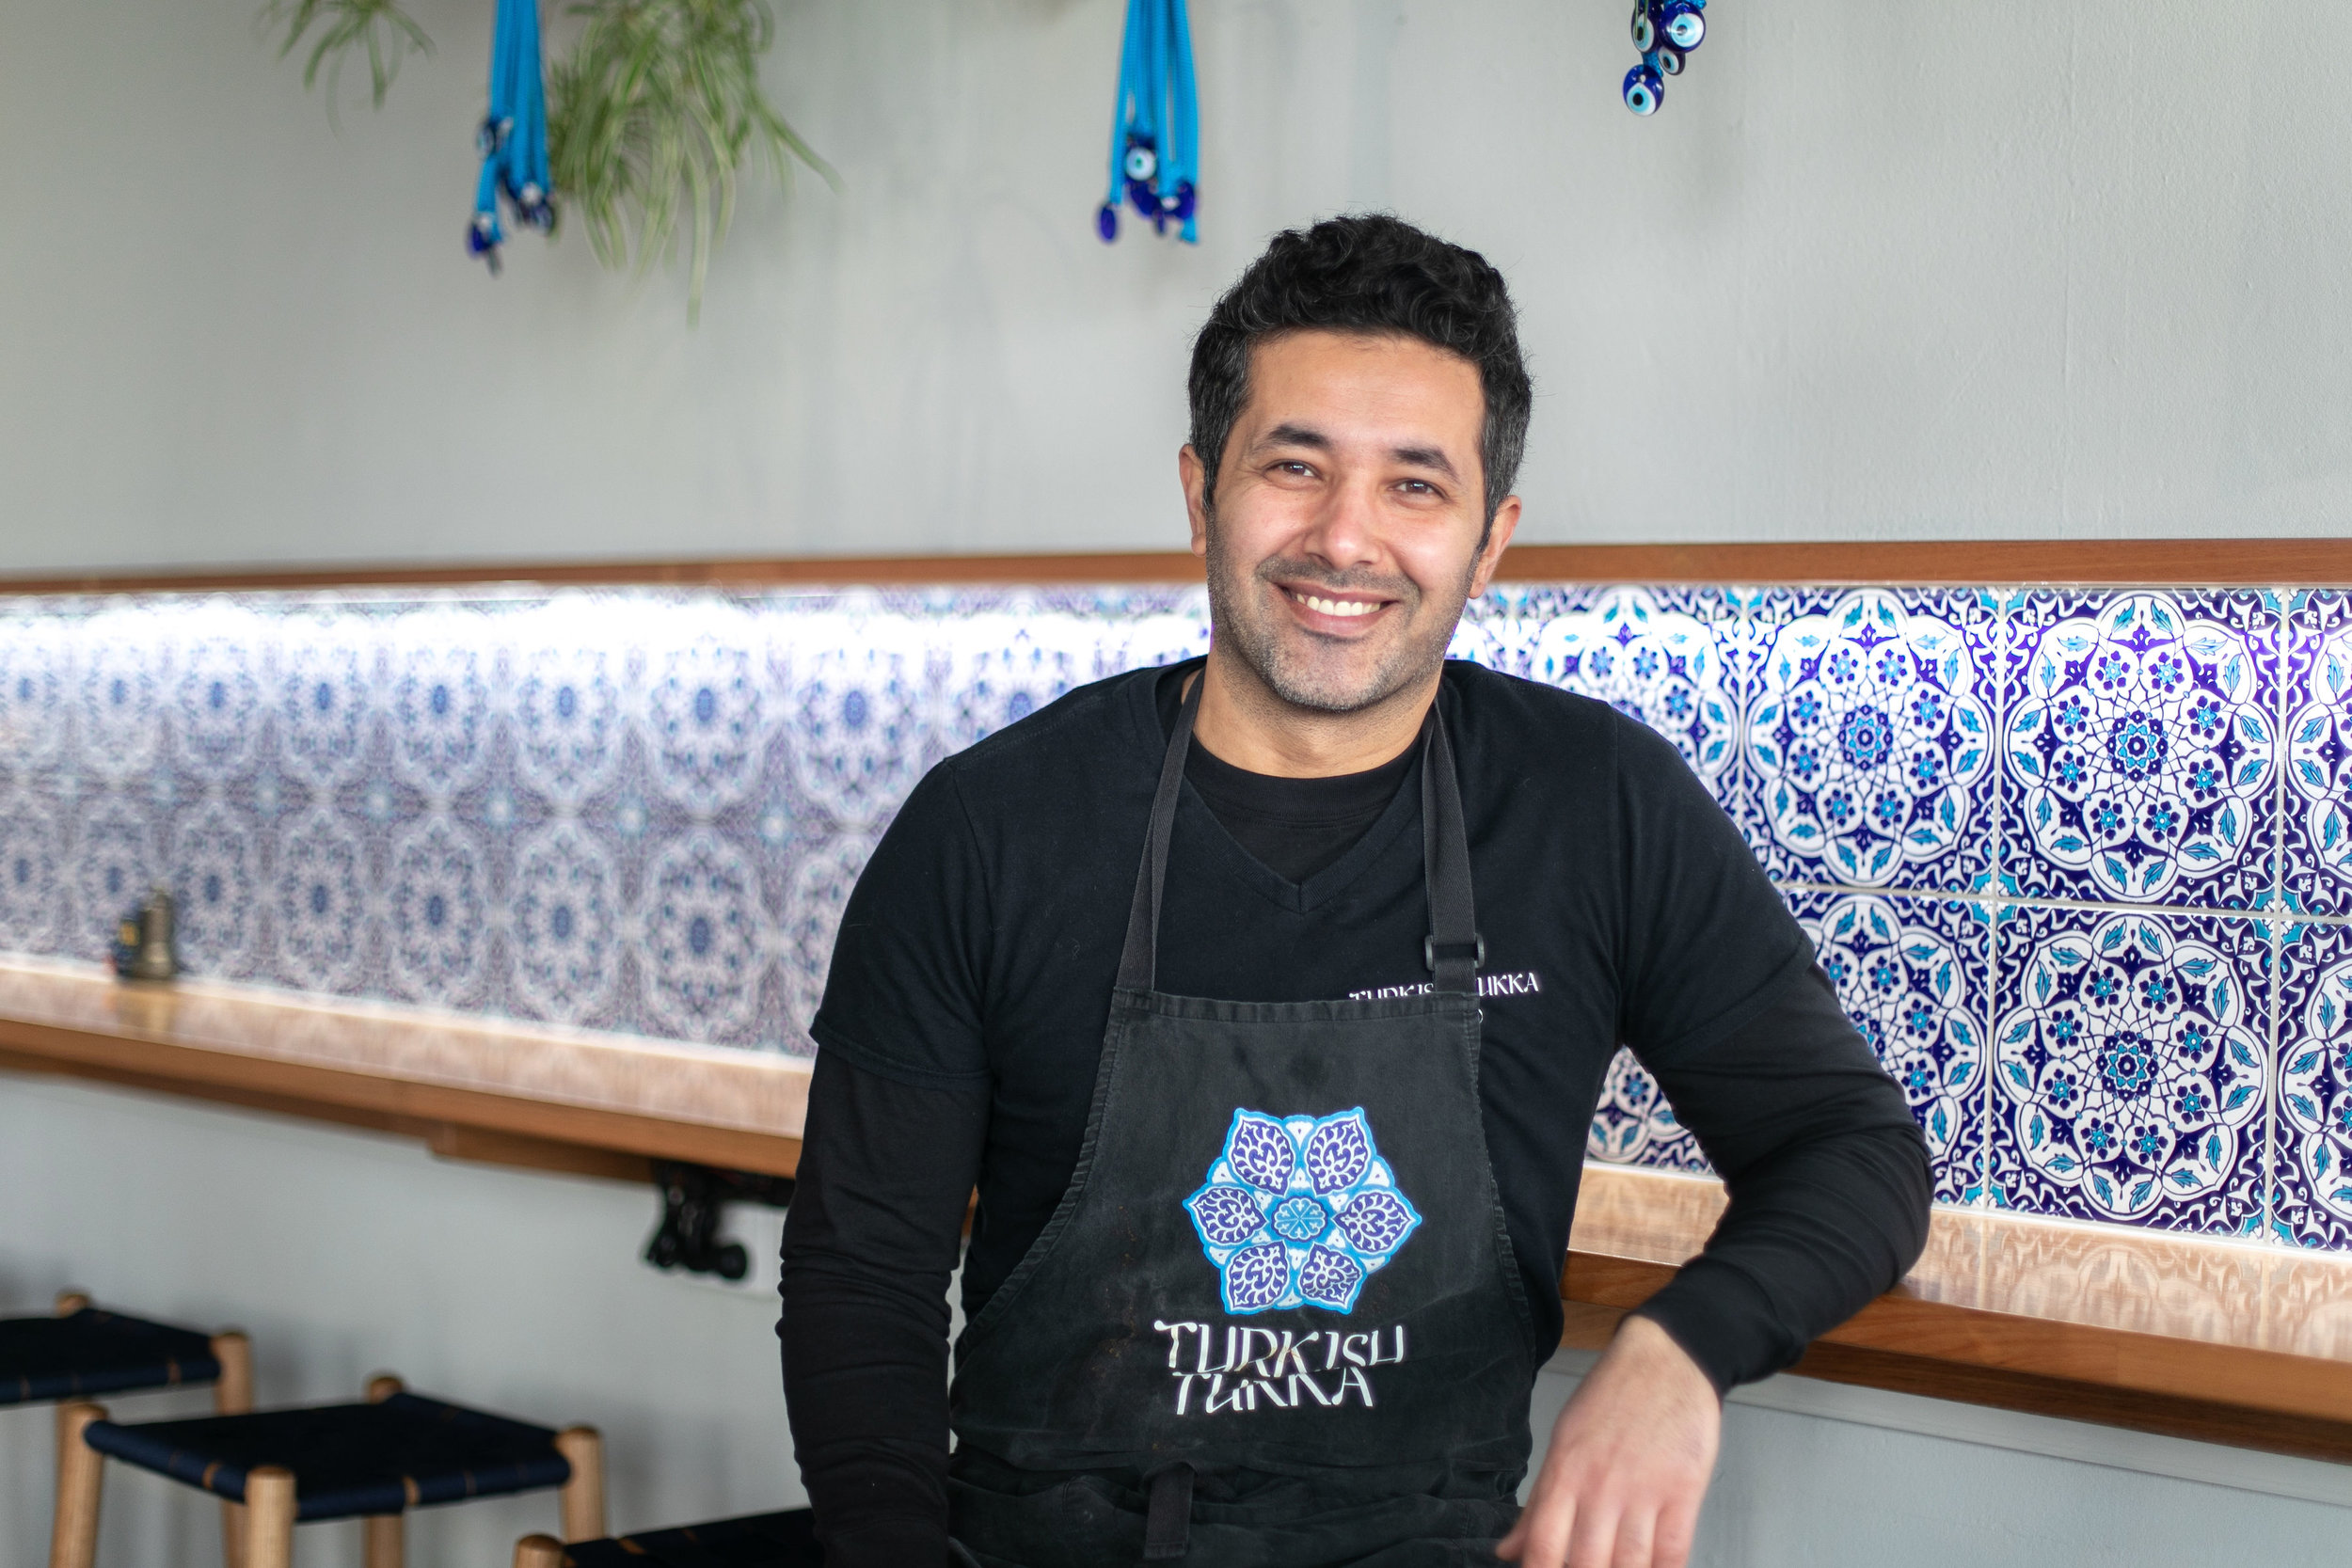 Yusuf Karazor, owner of Turkish Tukka, brings Anatolian flavours to George St. Image: Melanie de Ruyter for Winterlicous 2019.